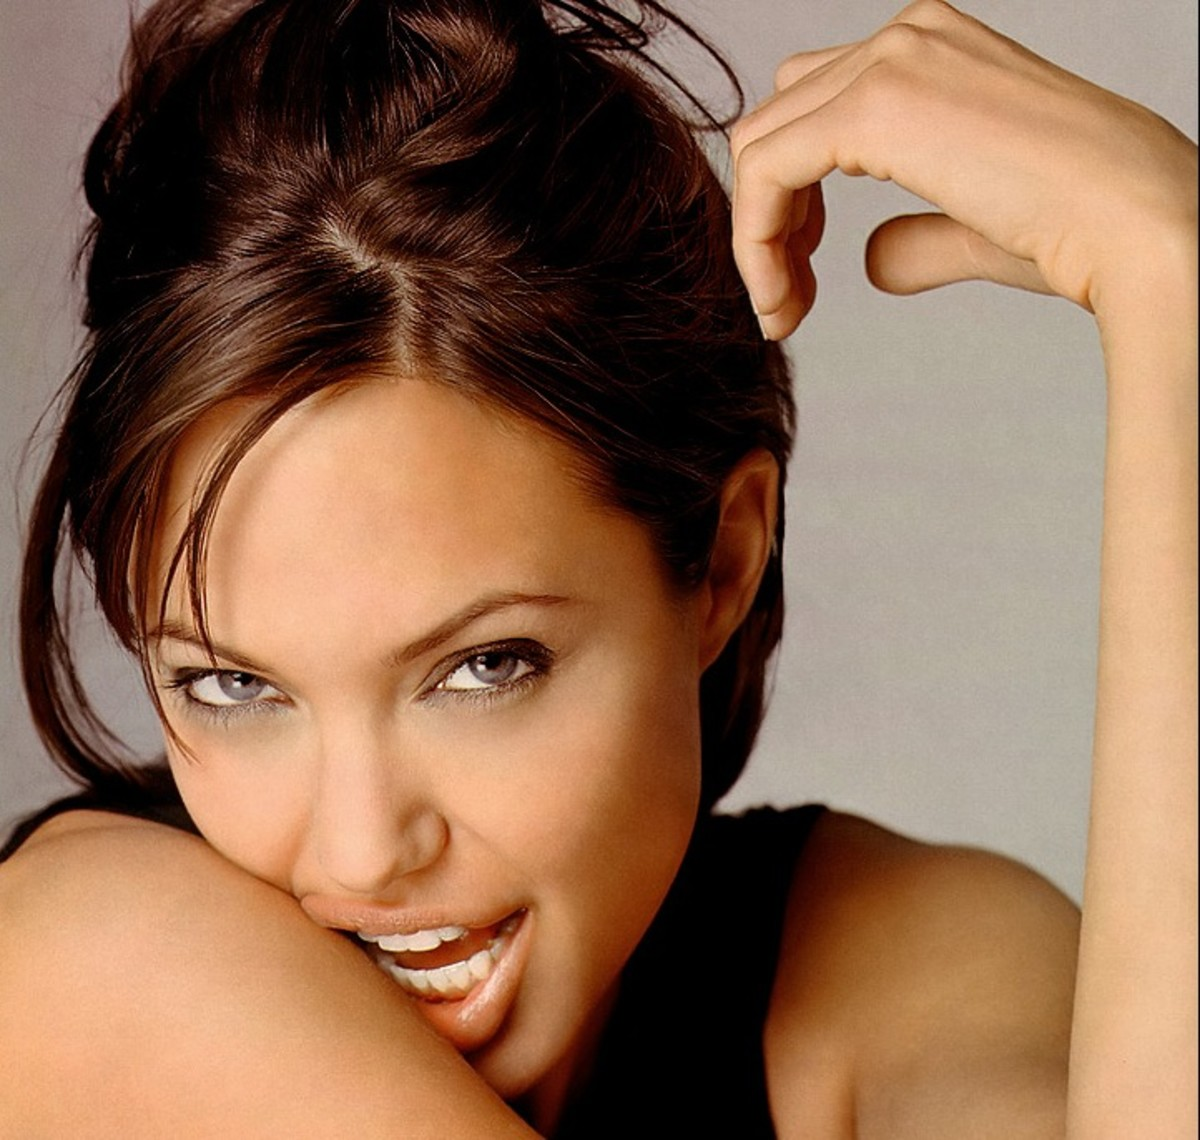 Angelina Jolie Hottest Pics photo 16